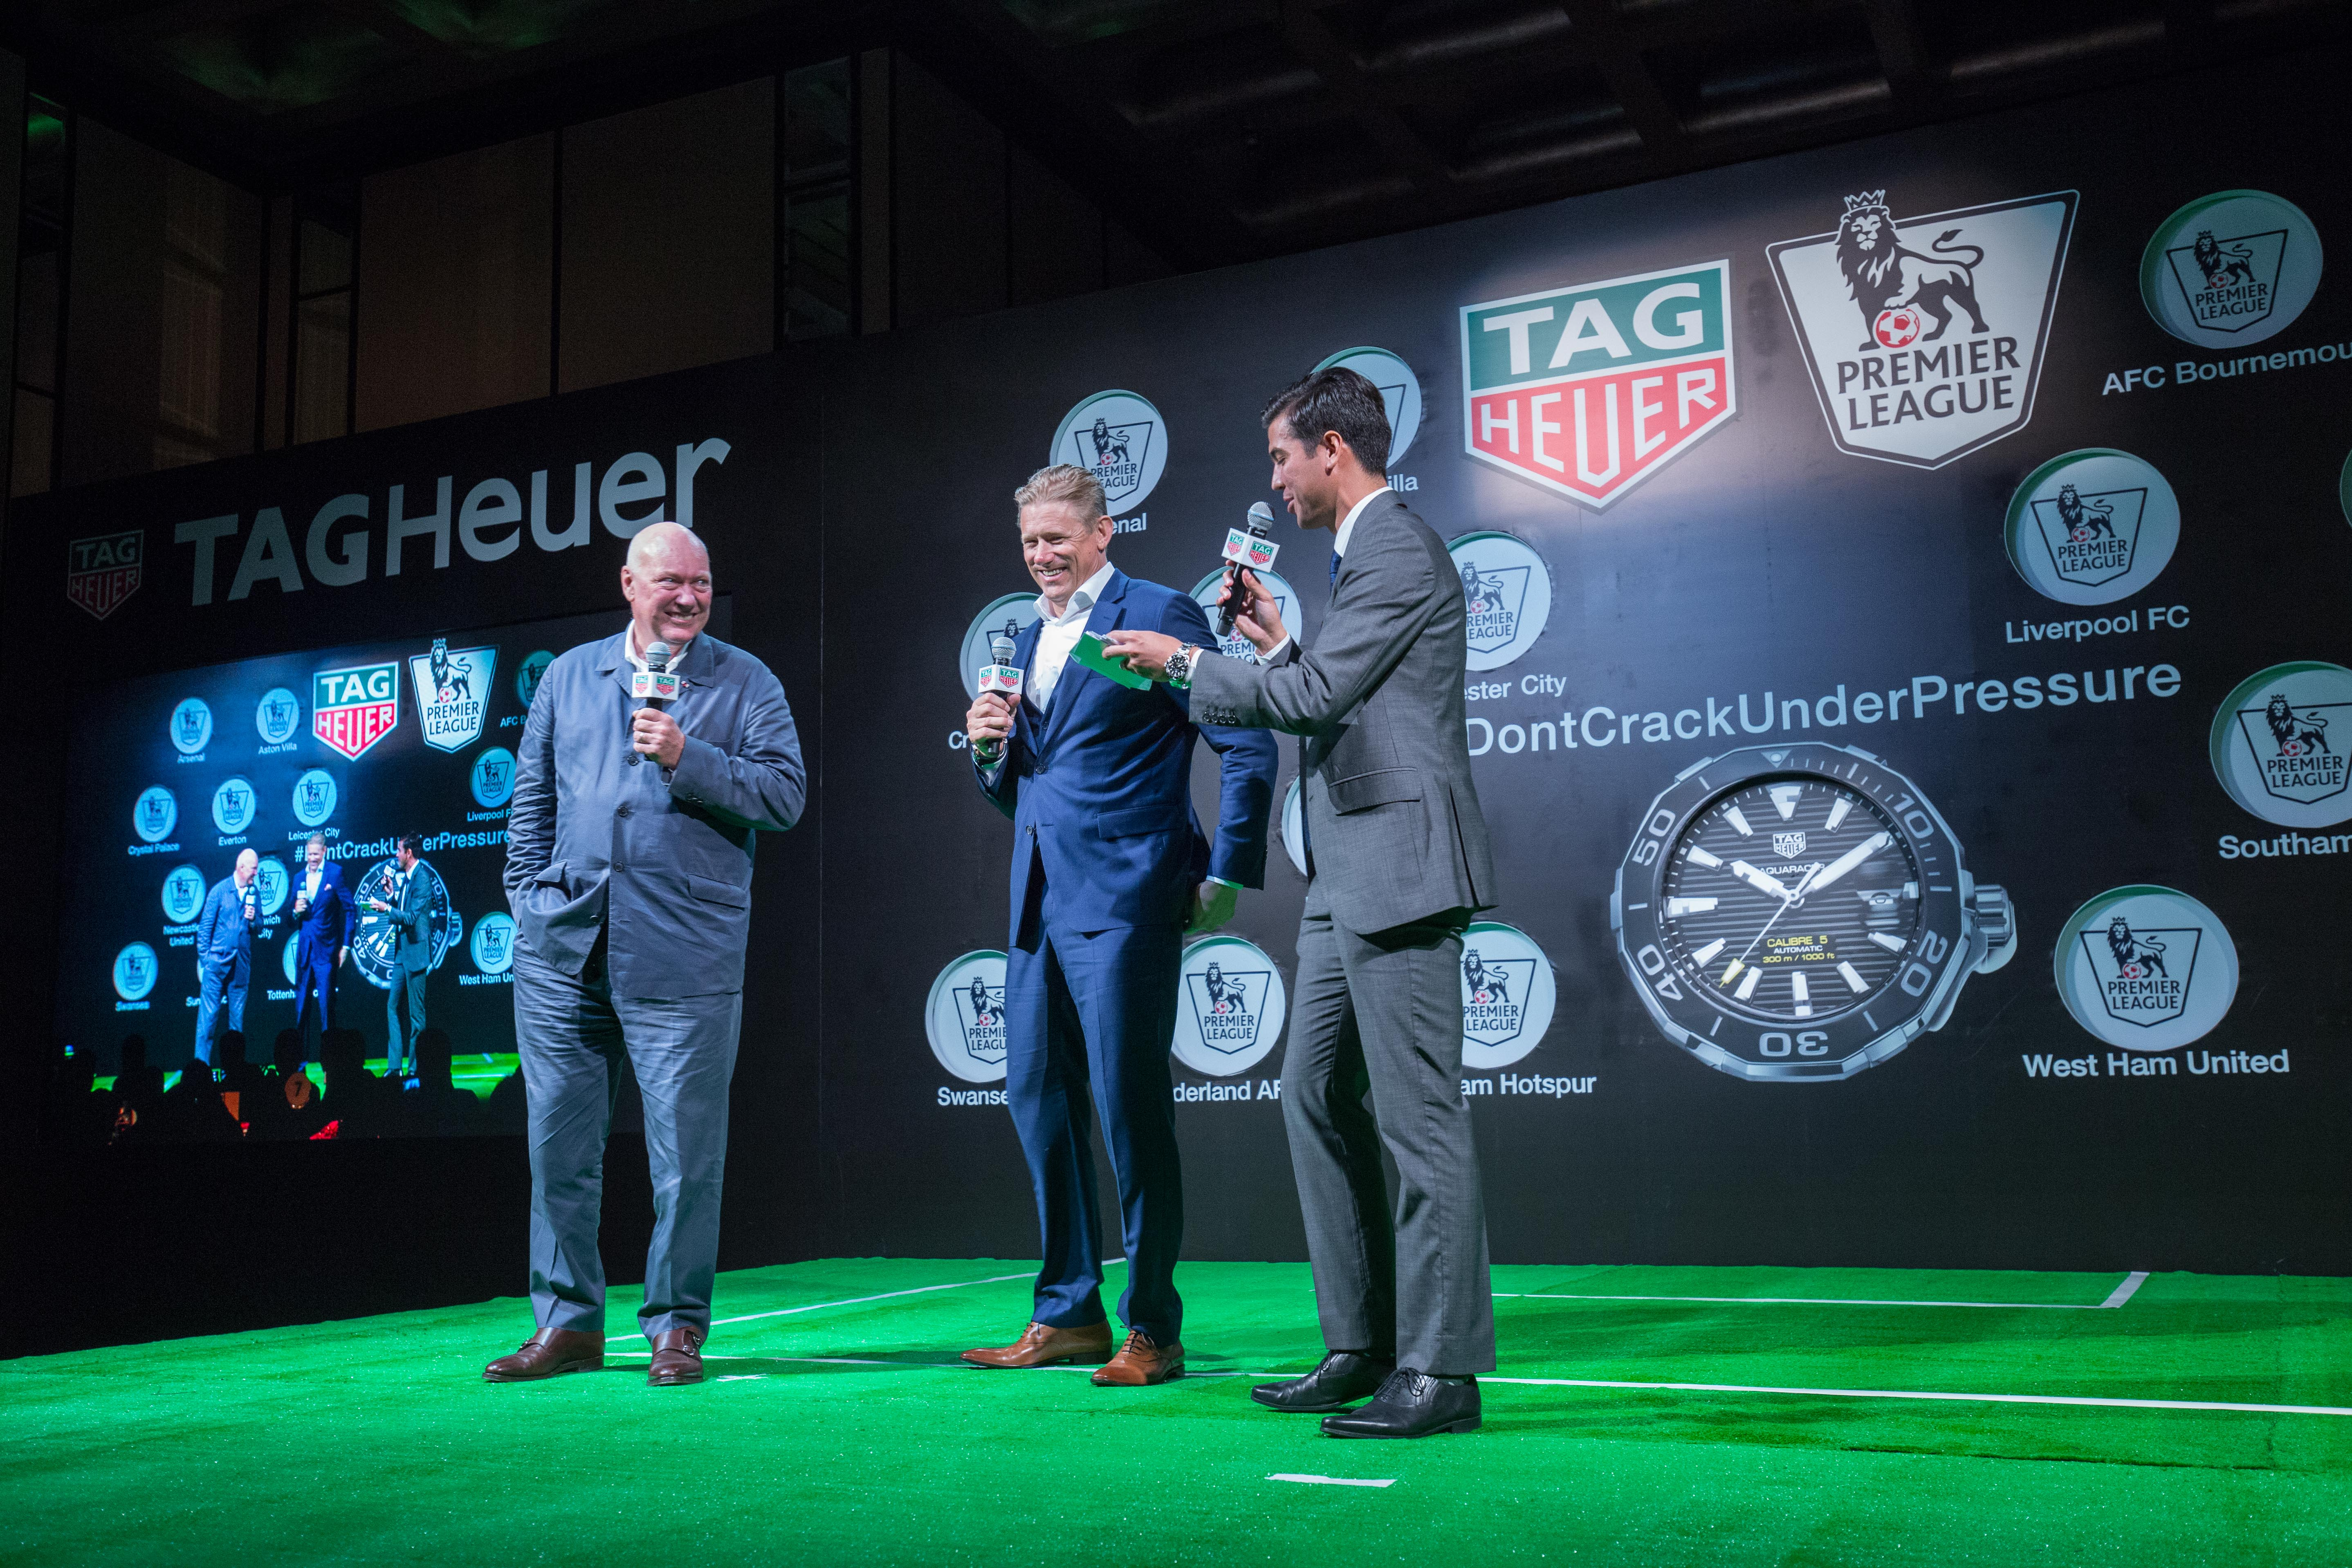 TAG Heuer & Premier League in HK (8)